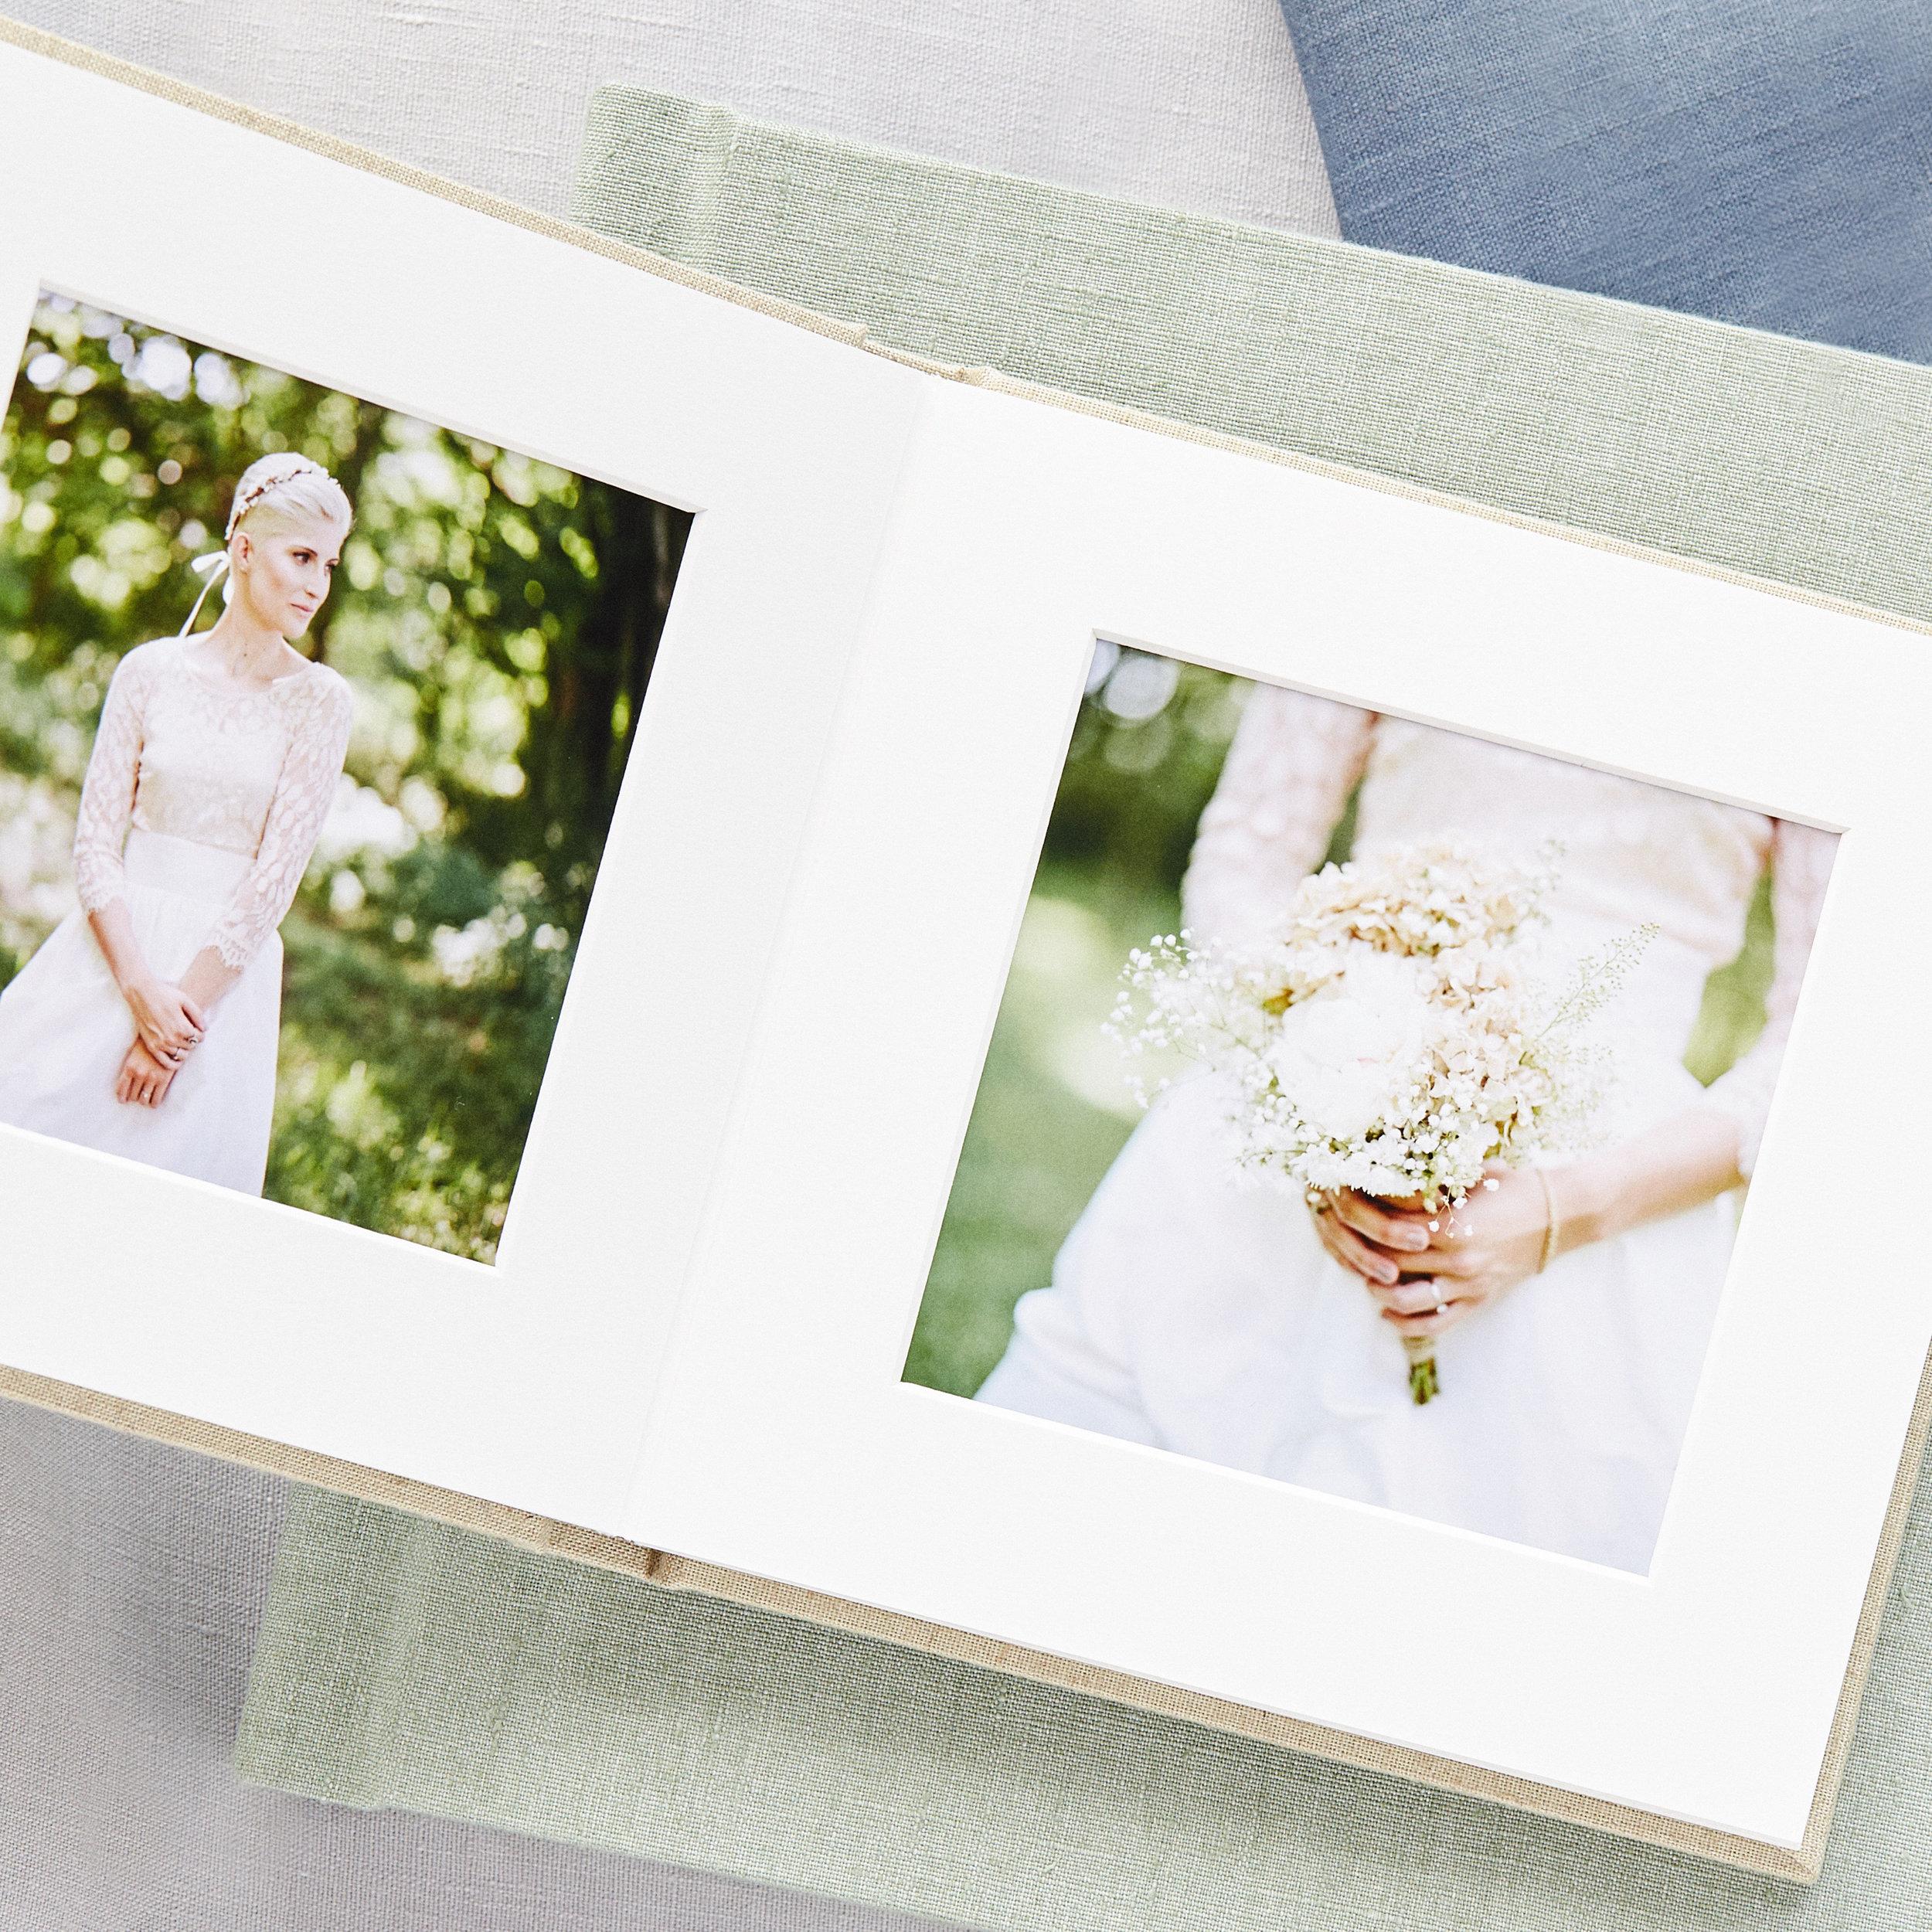 photographic printing in flush mount wedding album